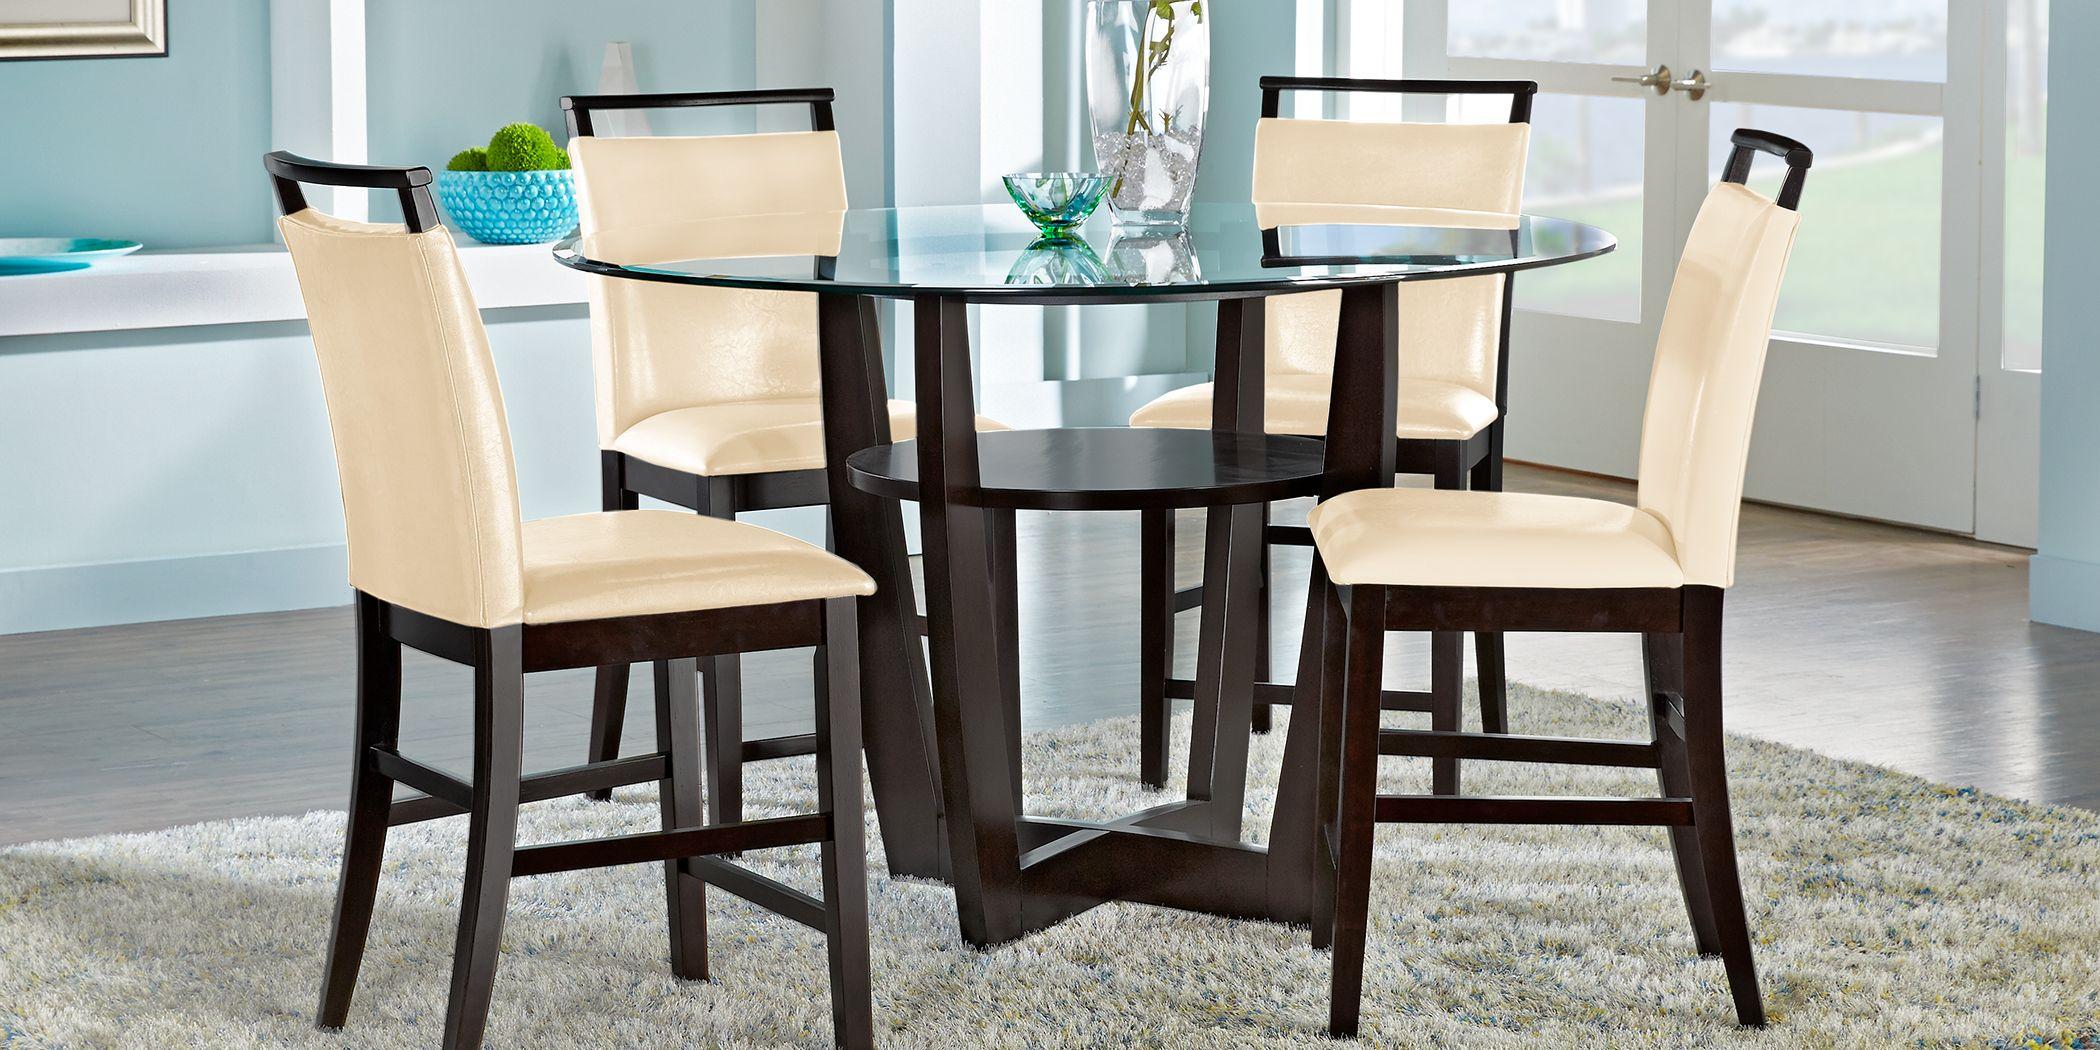 "Ciara Espresso 5 Pc 54"" Round Counter Height Dining Set with Cream Stools"